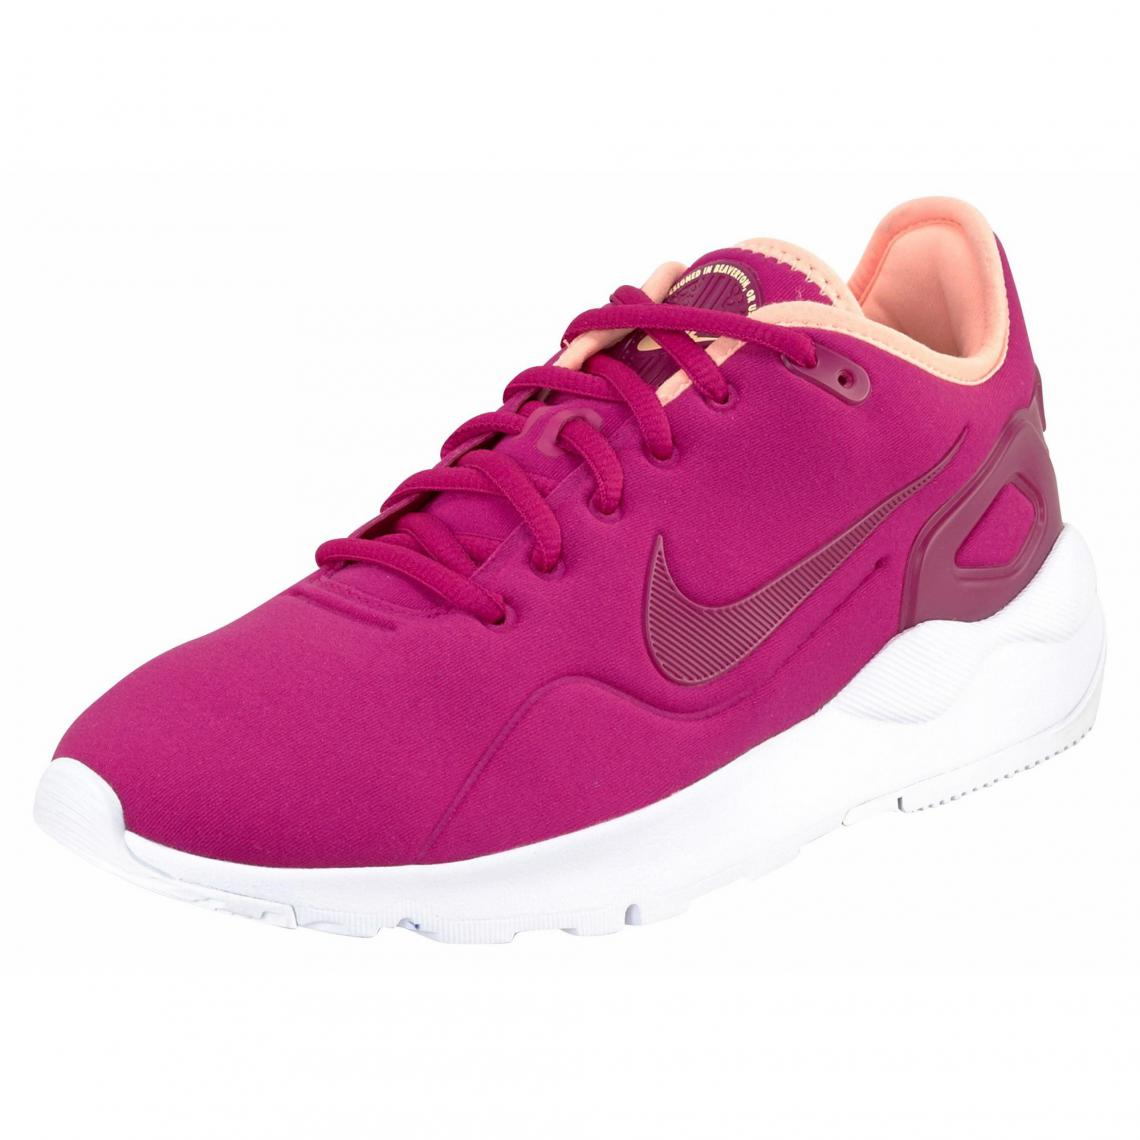 new york a07c6 9c174 Nike Sneaker »Wmns LD Runner LW SE« - Rose Vif   3 SUISSES